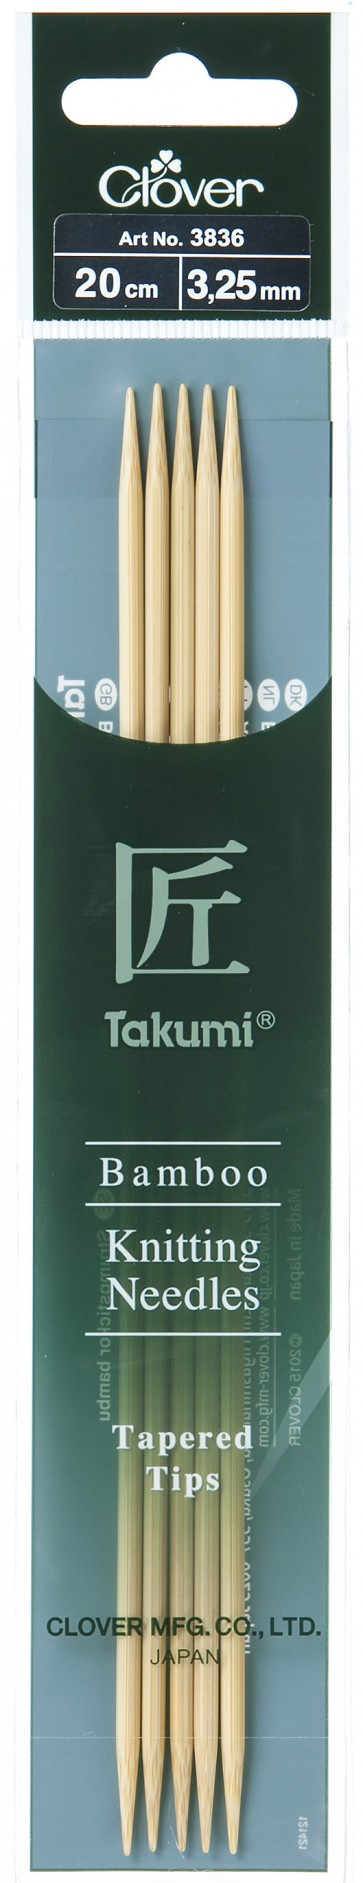 CLOVER Strumpfstrickndl Bambus Takumi 20cm/3.25mm